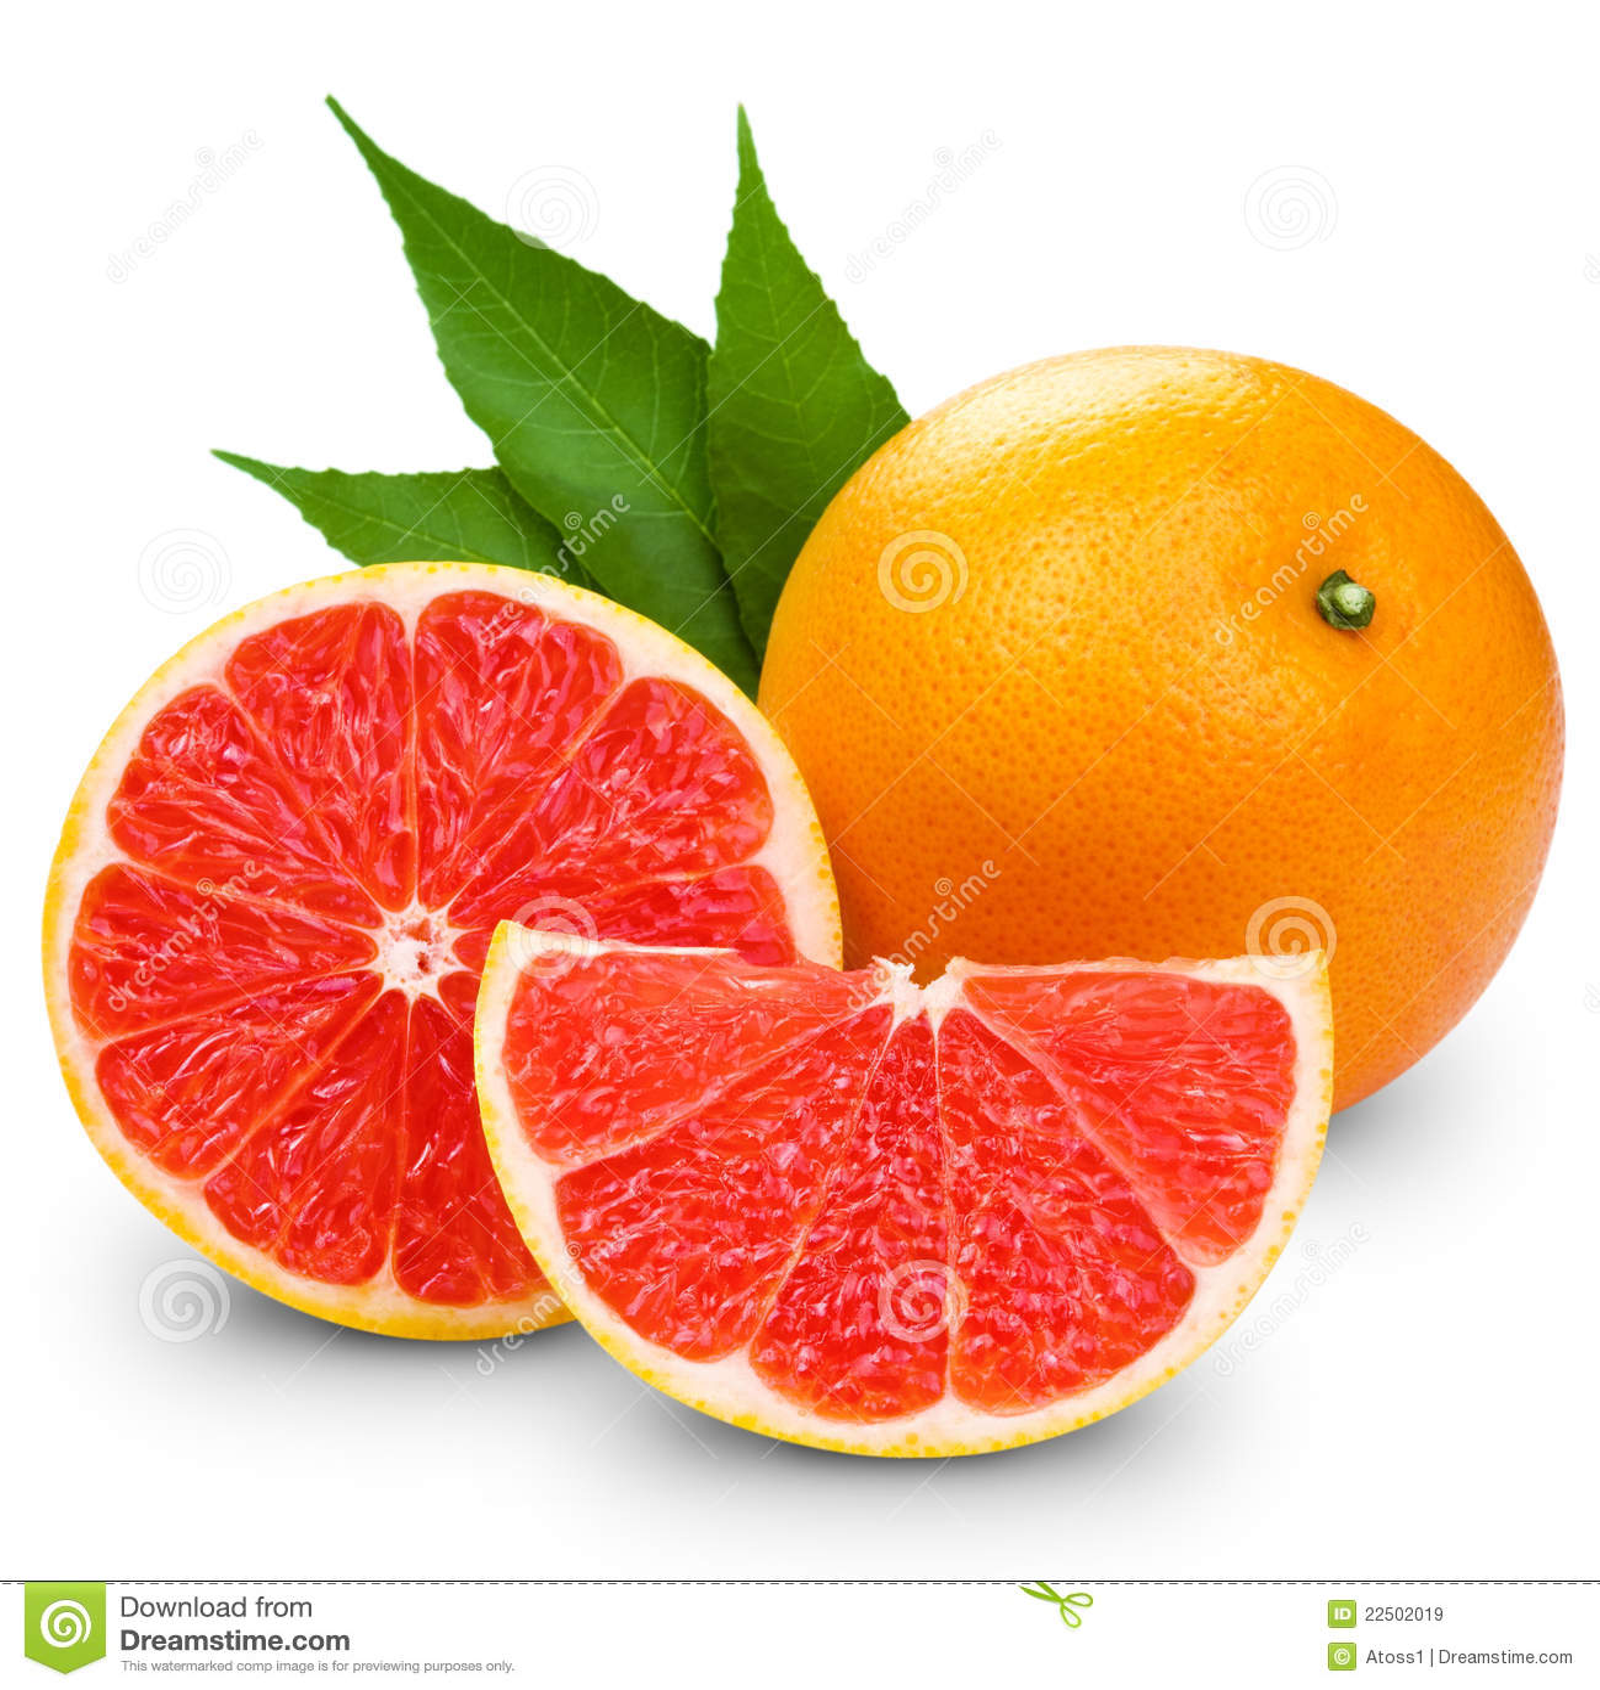 grapefruit royalty free stock images image 22502019 free clipart of apple hill free clipart of apple hill